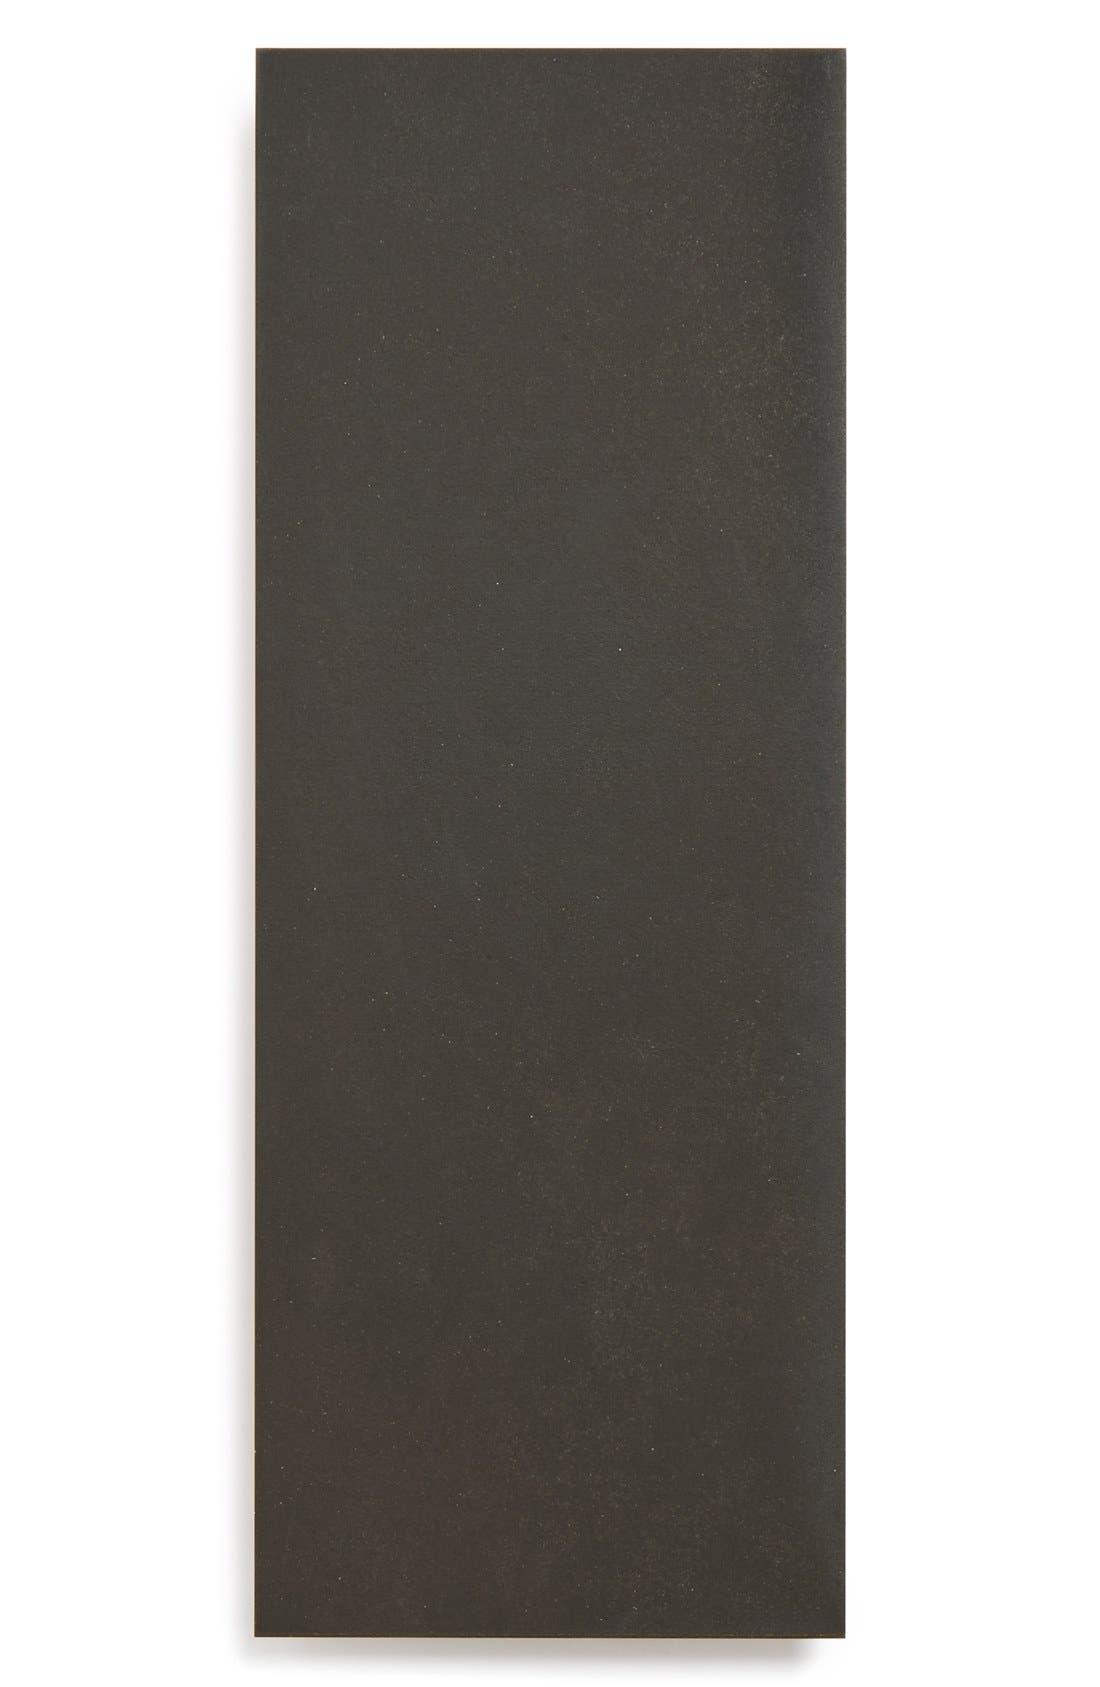 Main Image - Petal Lane 11 Inch Letter Magnetized Chalkboard